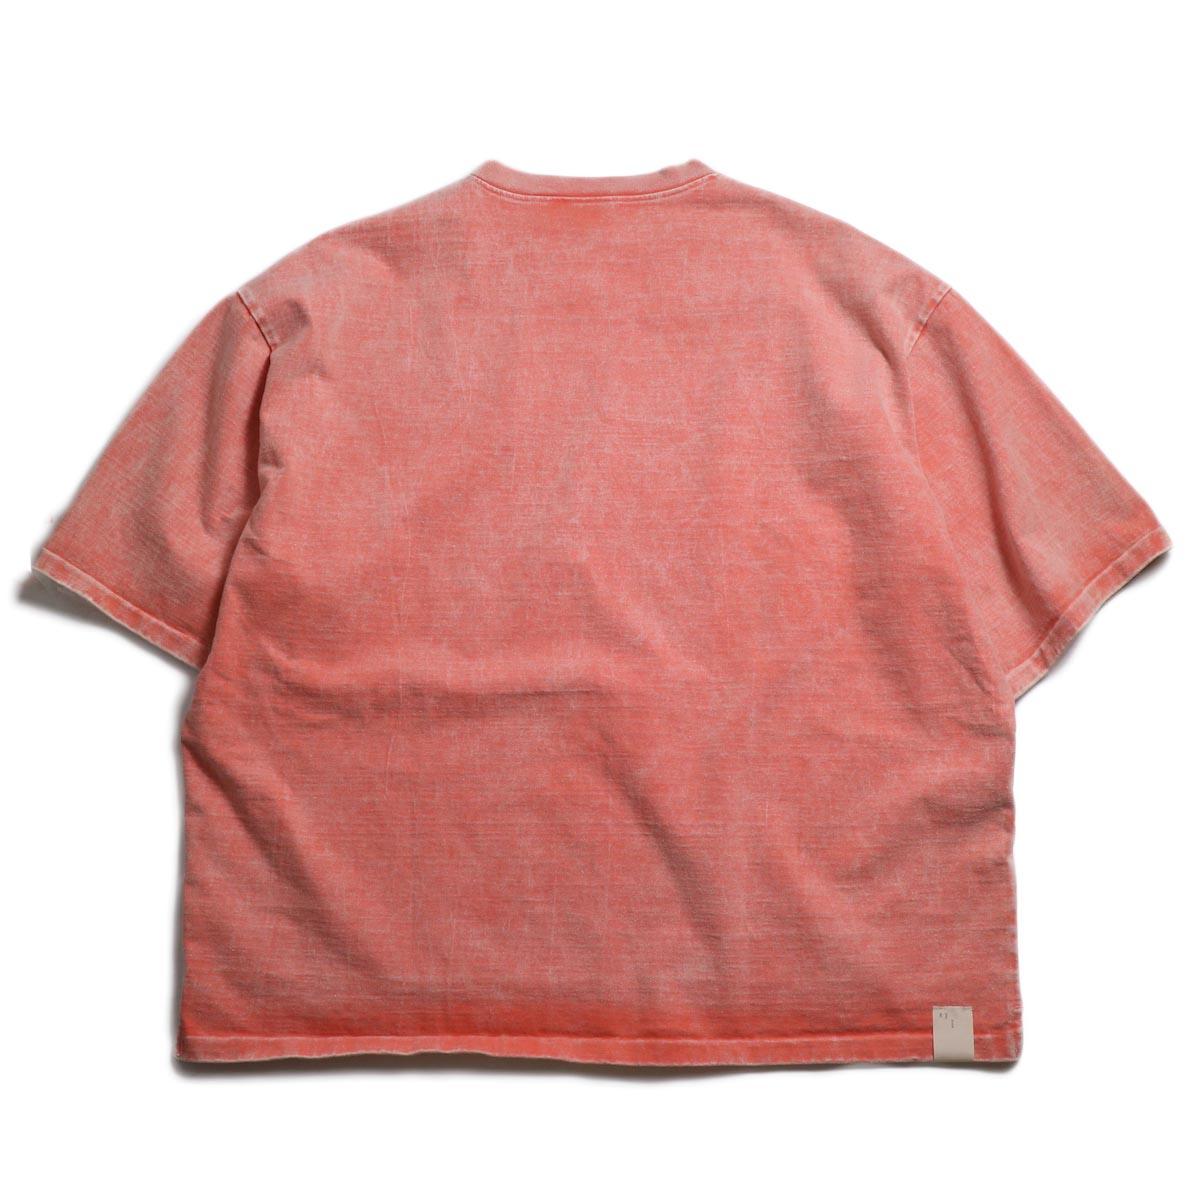 N.HOOLYWOOD × Gramicci  / 191-CS27-024 Short Sleeve Tee -Pink 背面